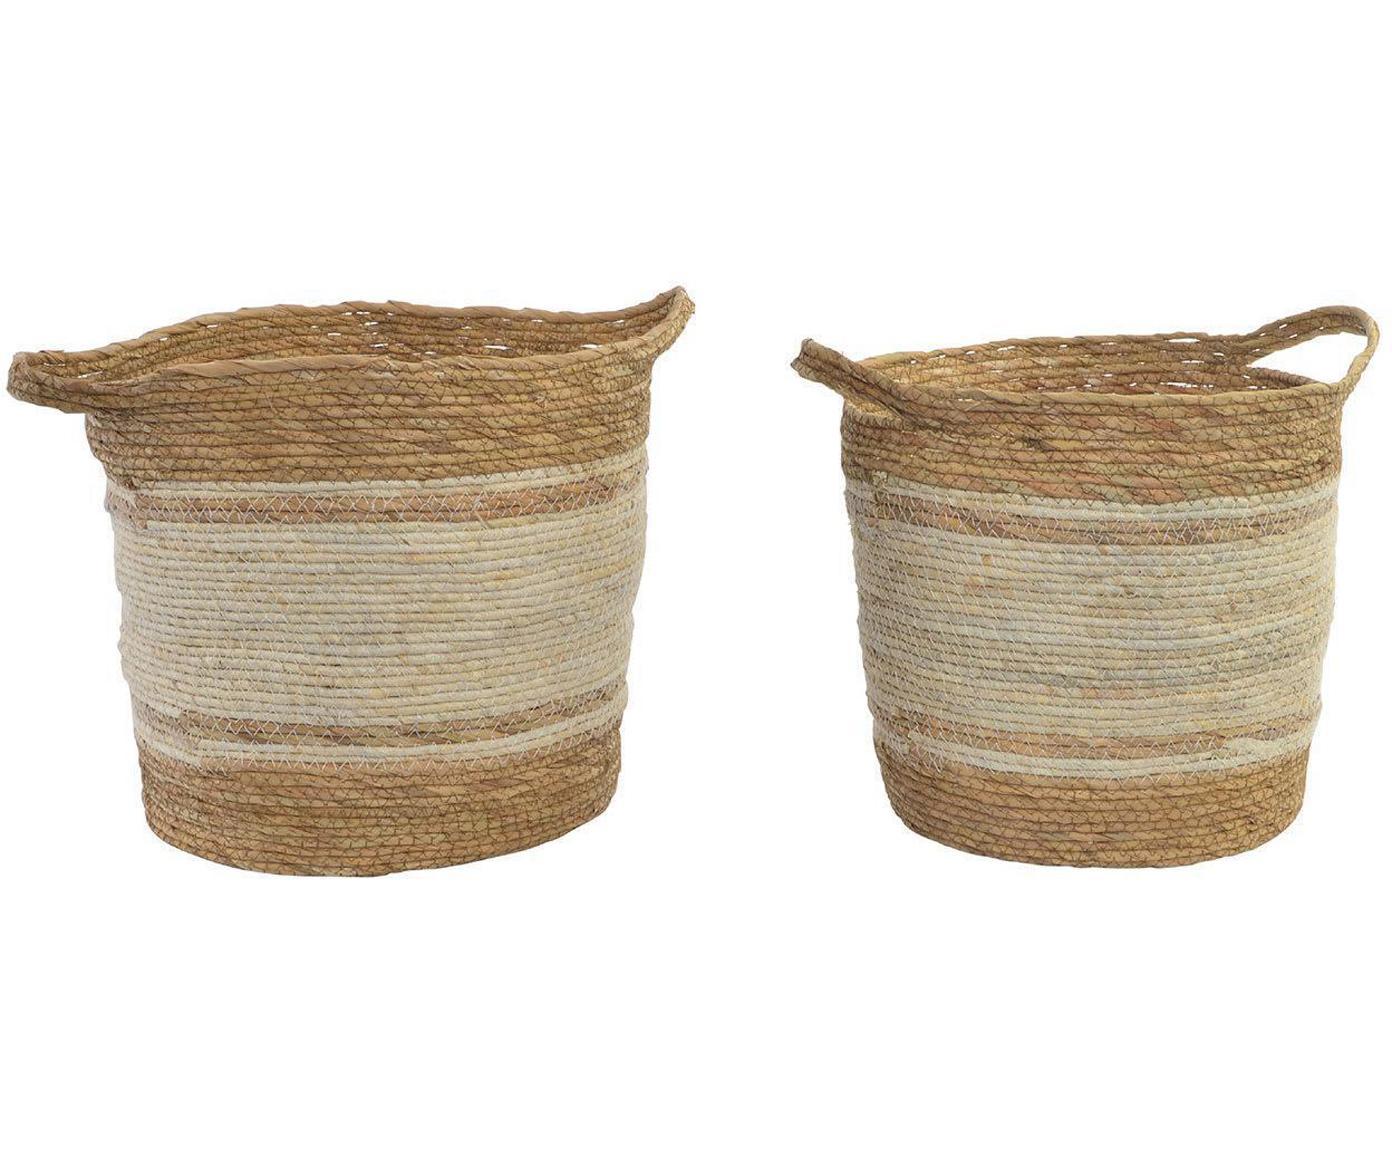 Set de cestas Bibi, 2pzas., FIbra natural, Marrón, Tamaños diferentes